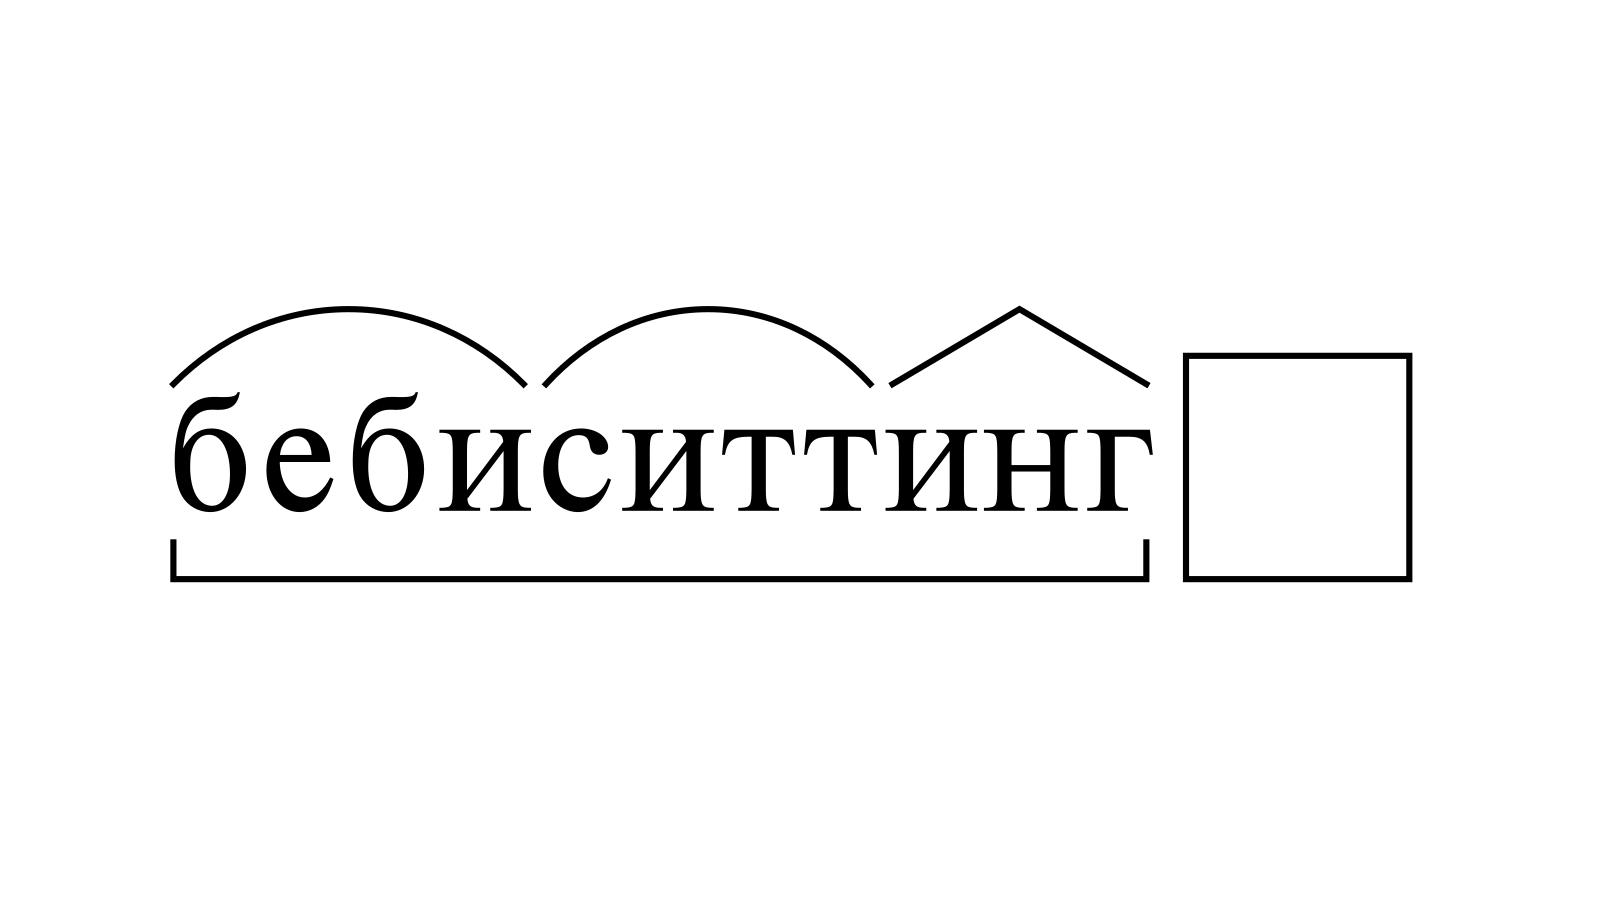 Разбор слова «бебиситтинг» по составу